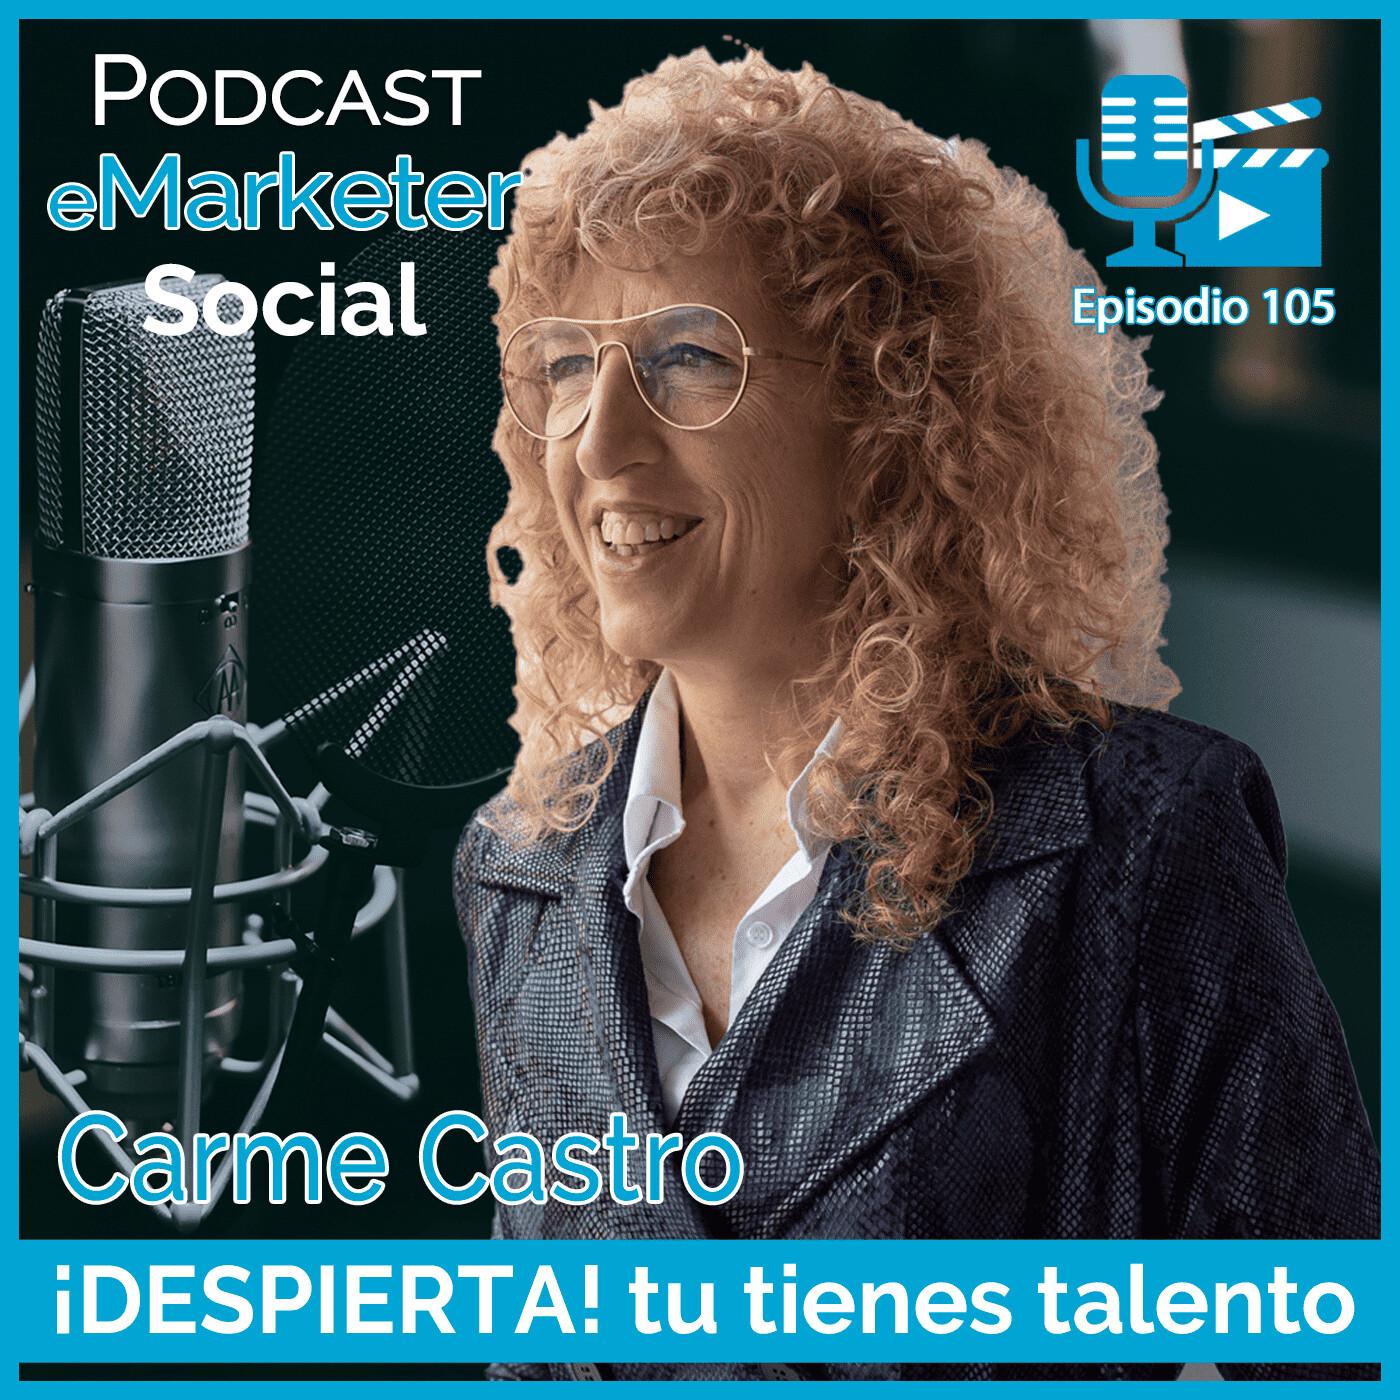 105 Carme Castro coach y fundadora de Kainova en Podcast eMarketerSocial